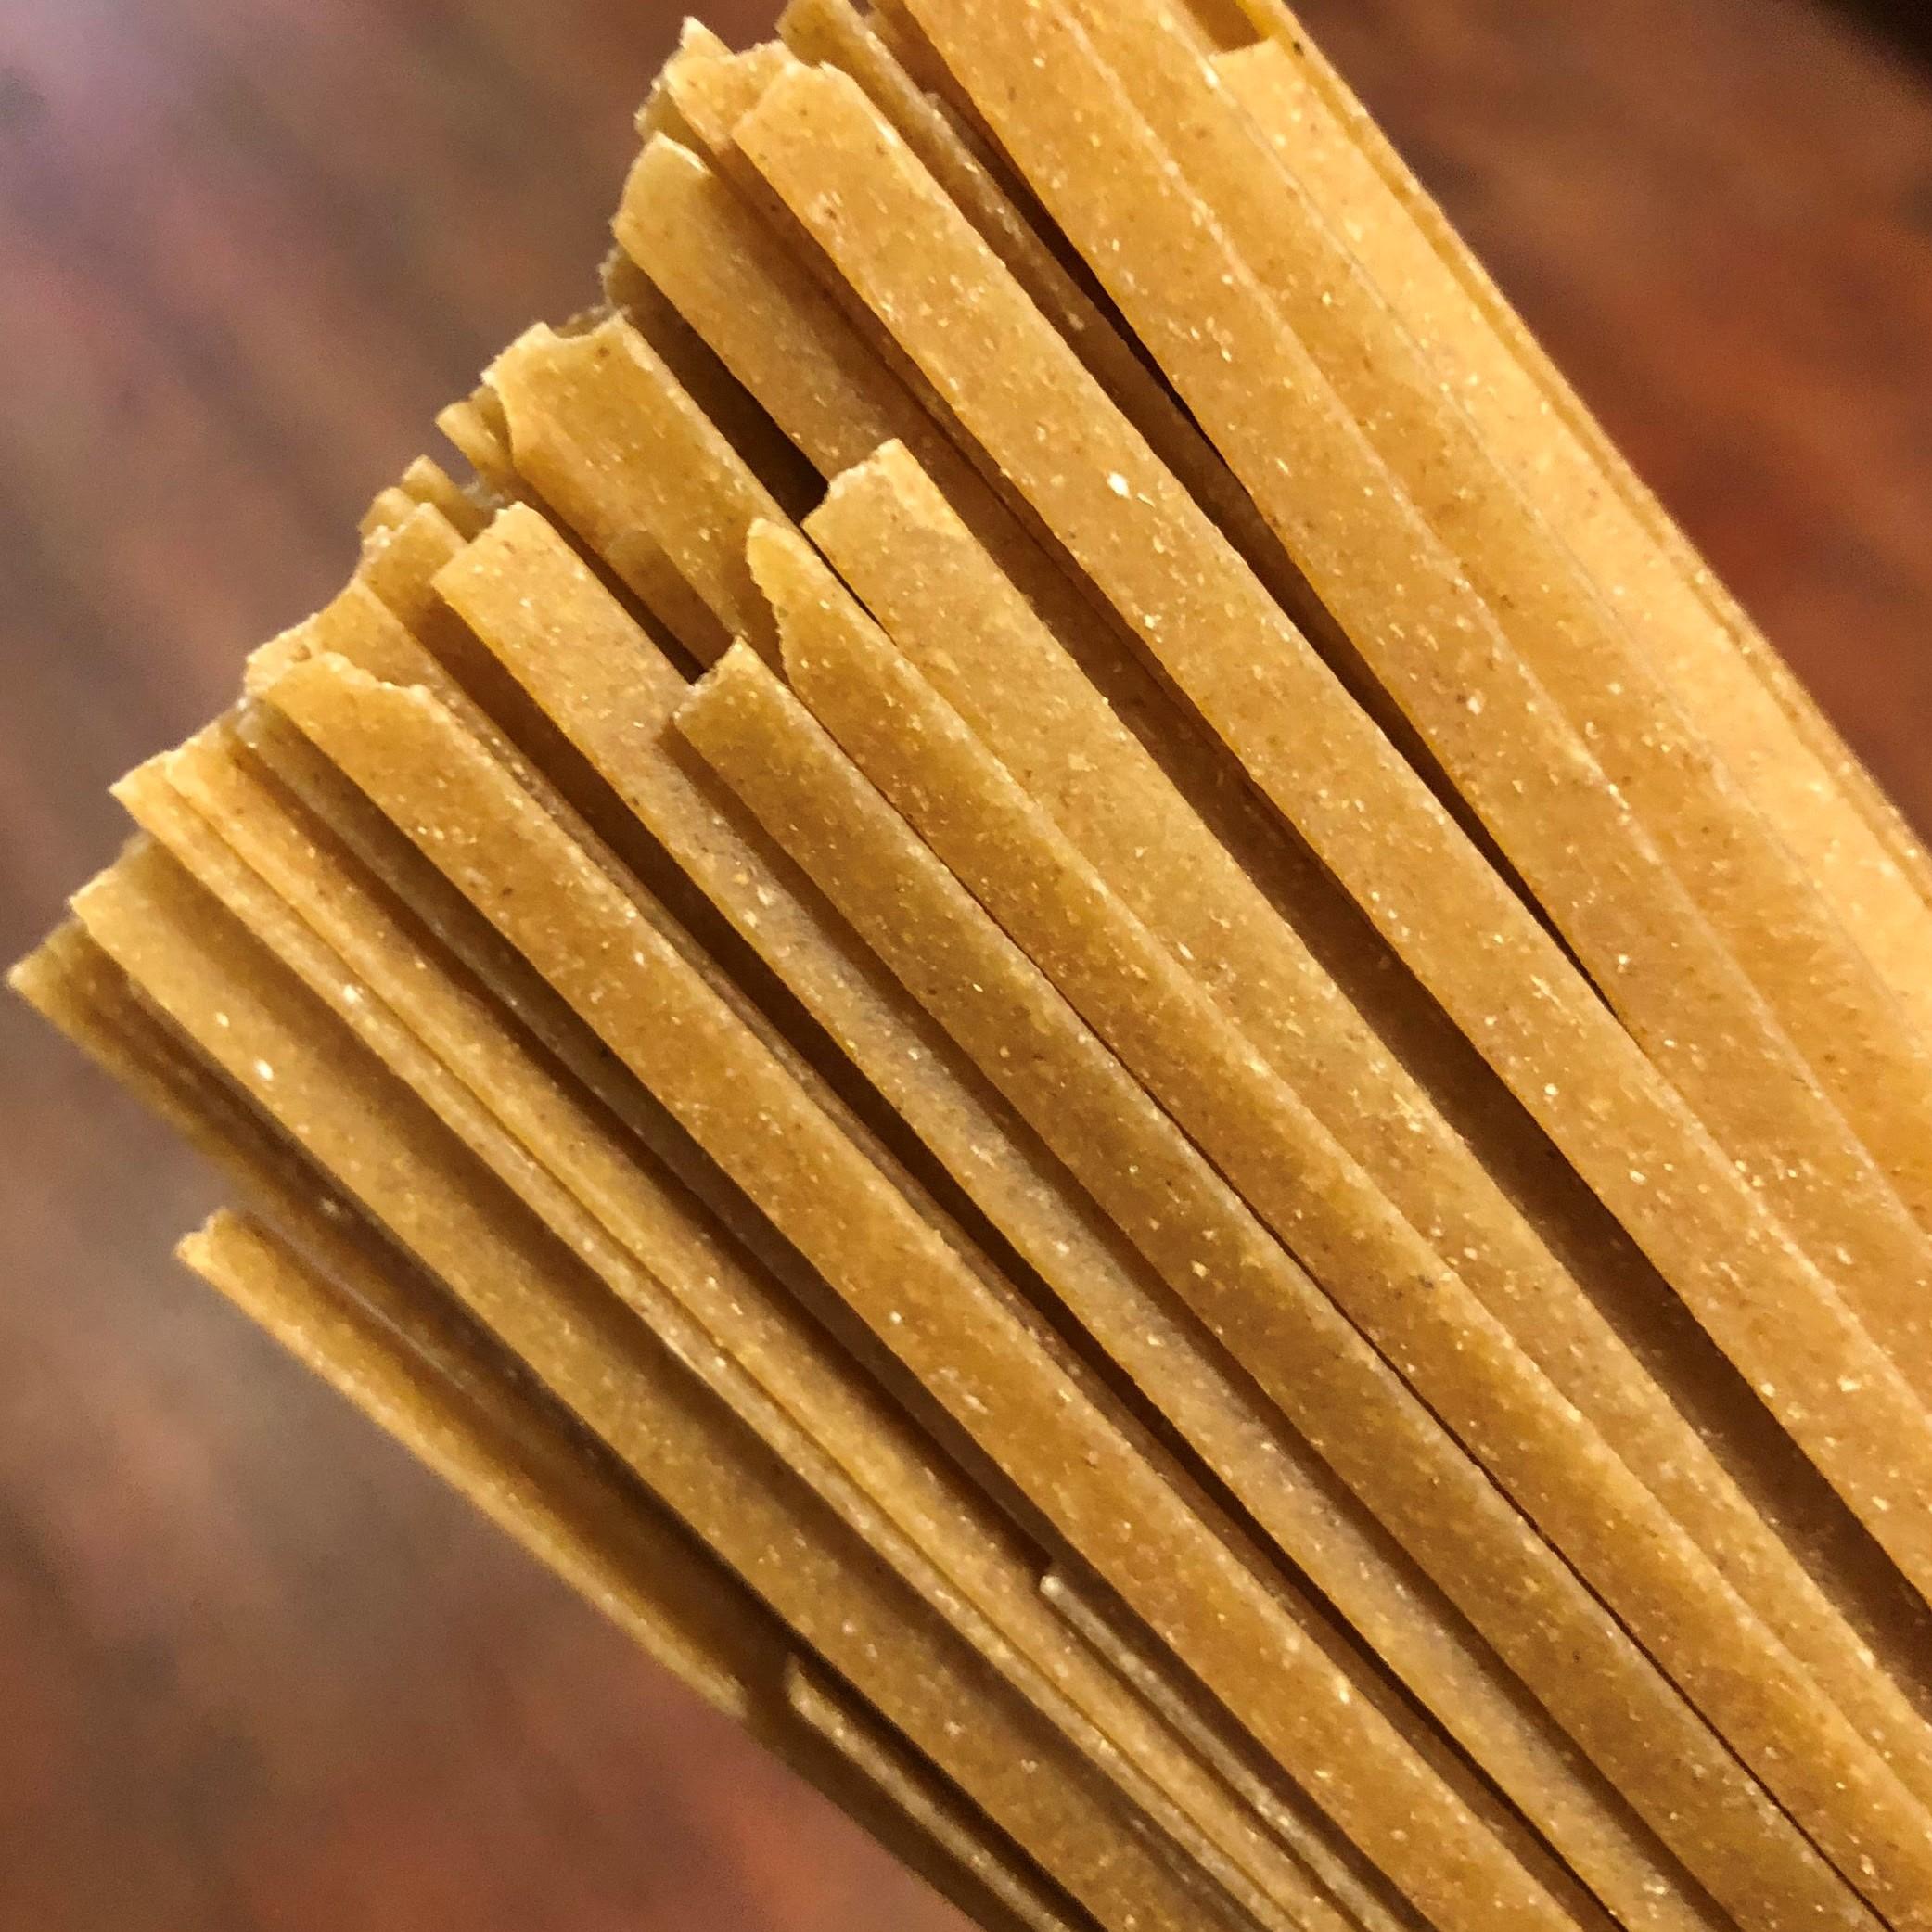 Tagliatelle, Wholewheat (Organic) - (250g)